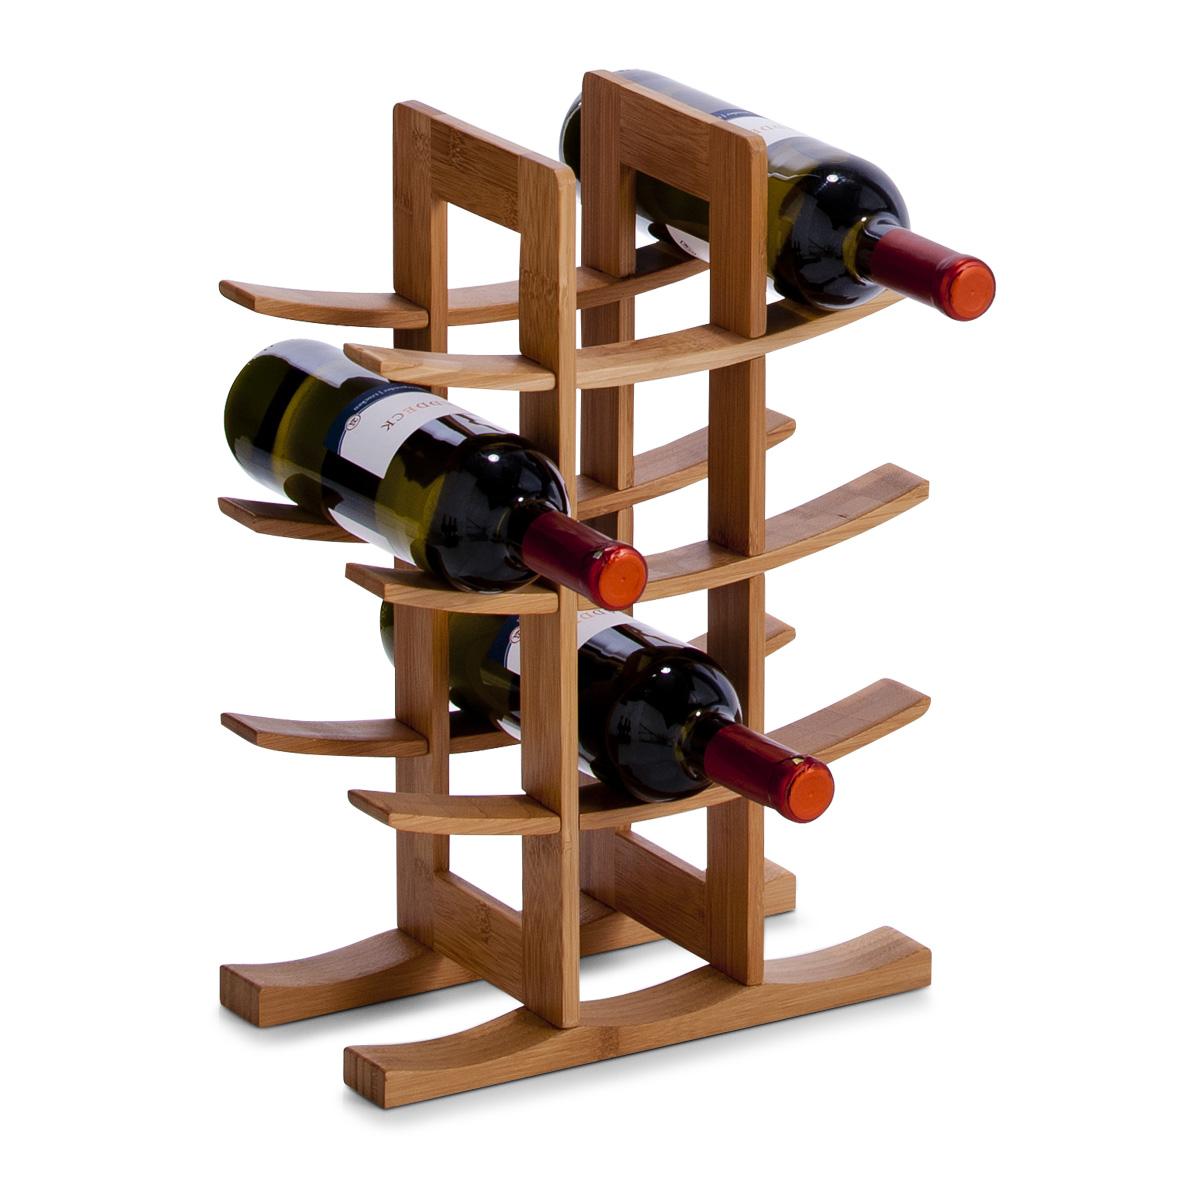 Zeller, Stojan na víno, bambus, 13580